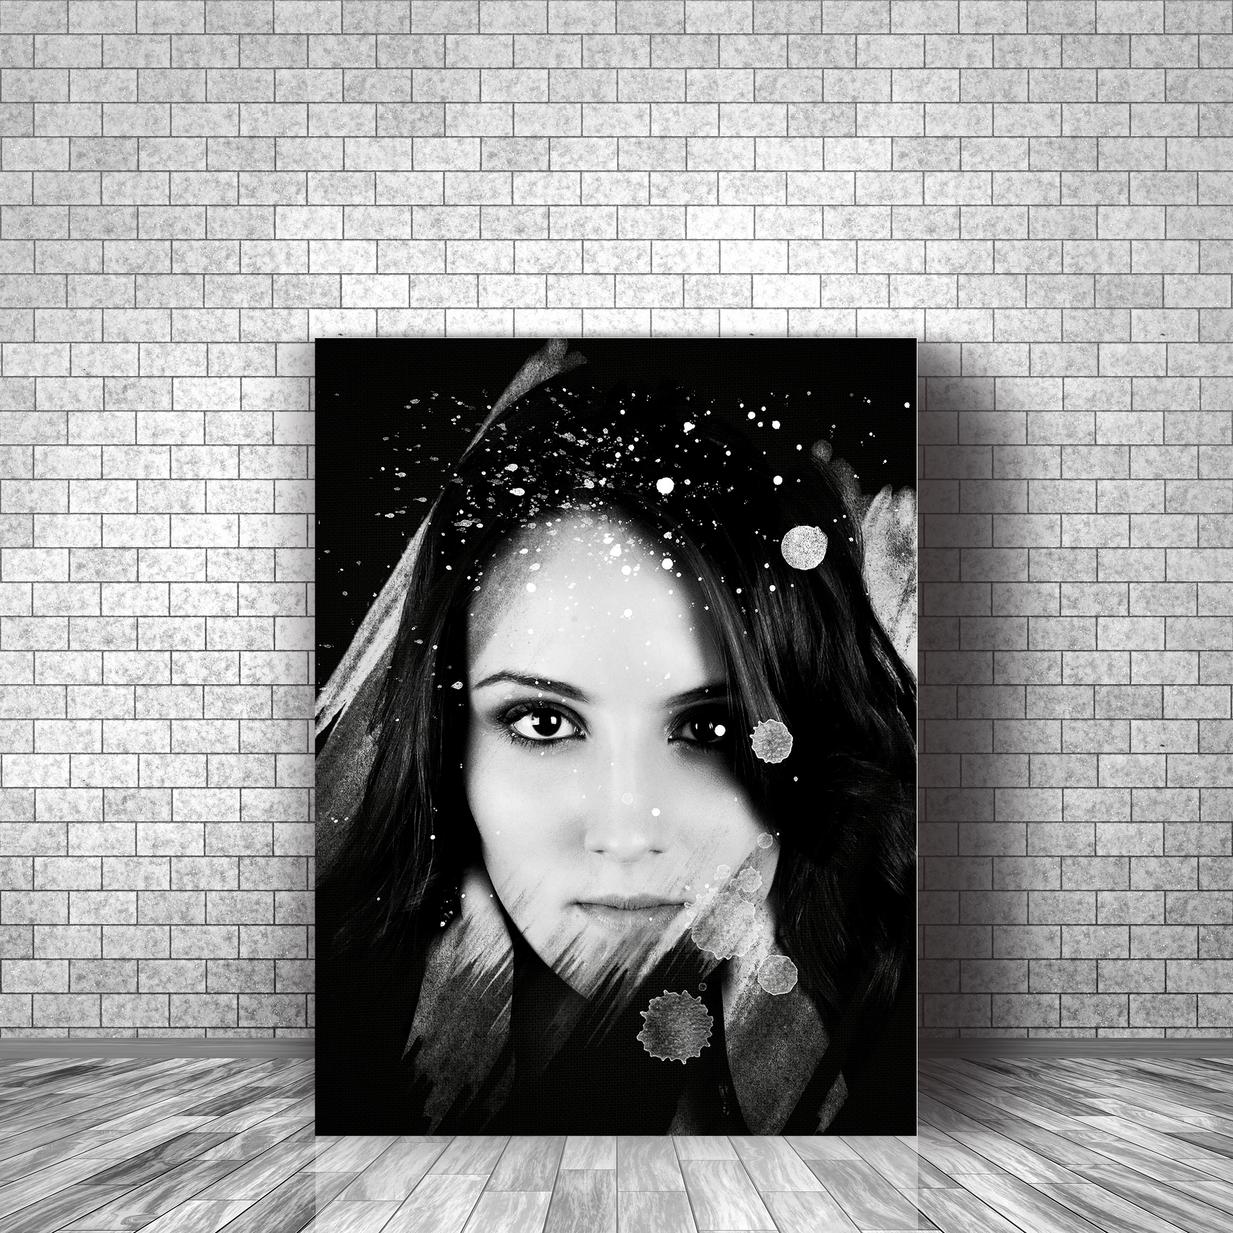 Art Photo effet 14 Black Background toil